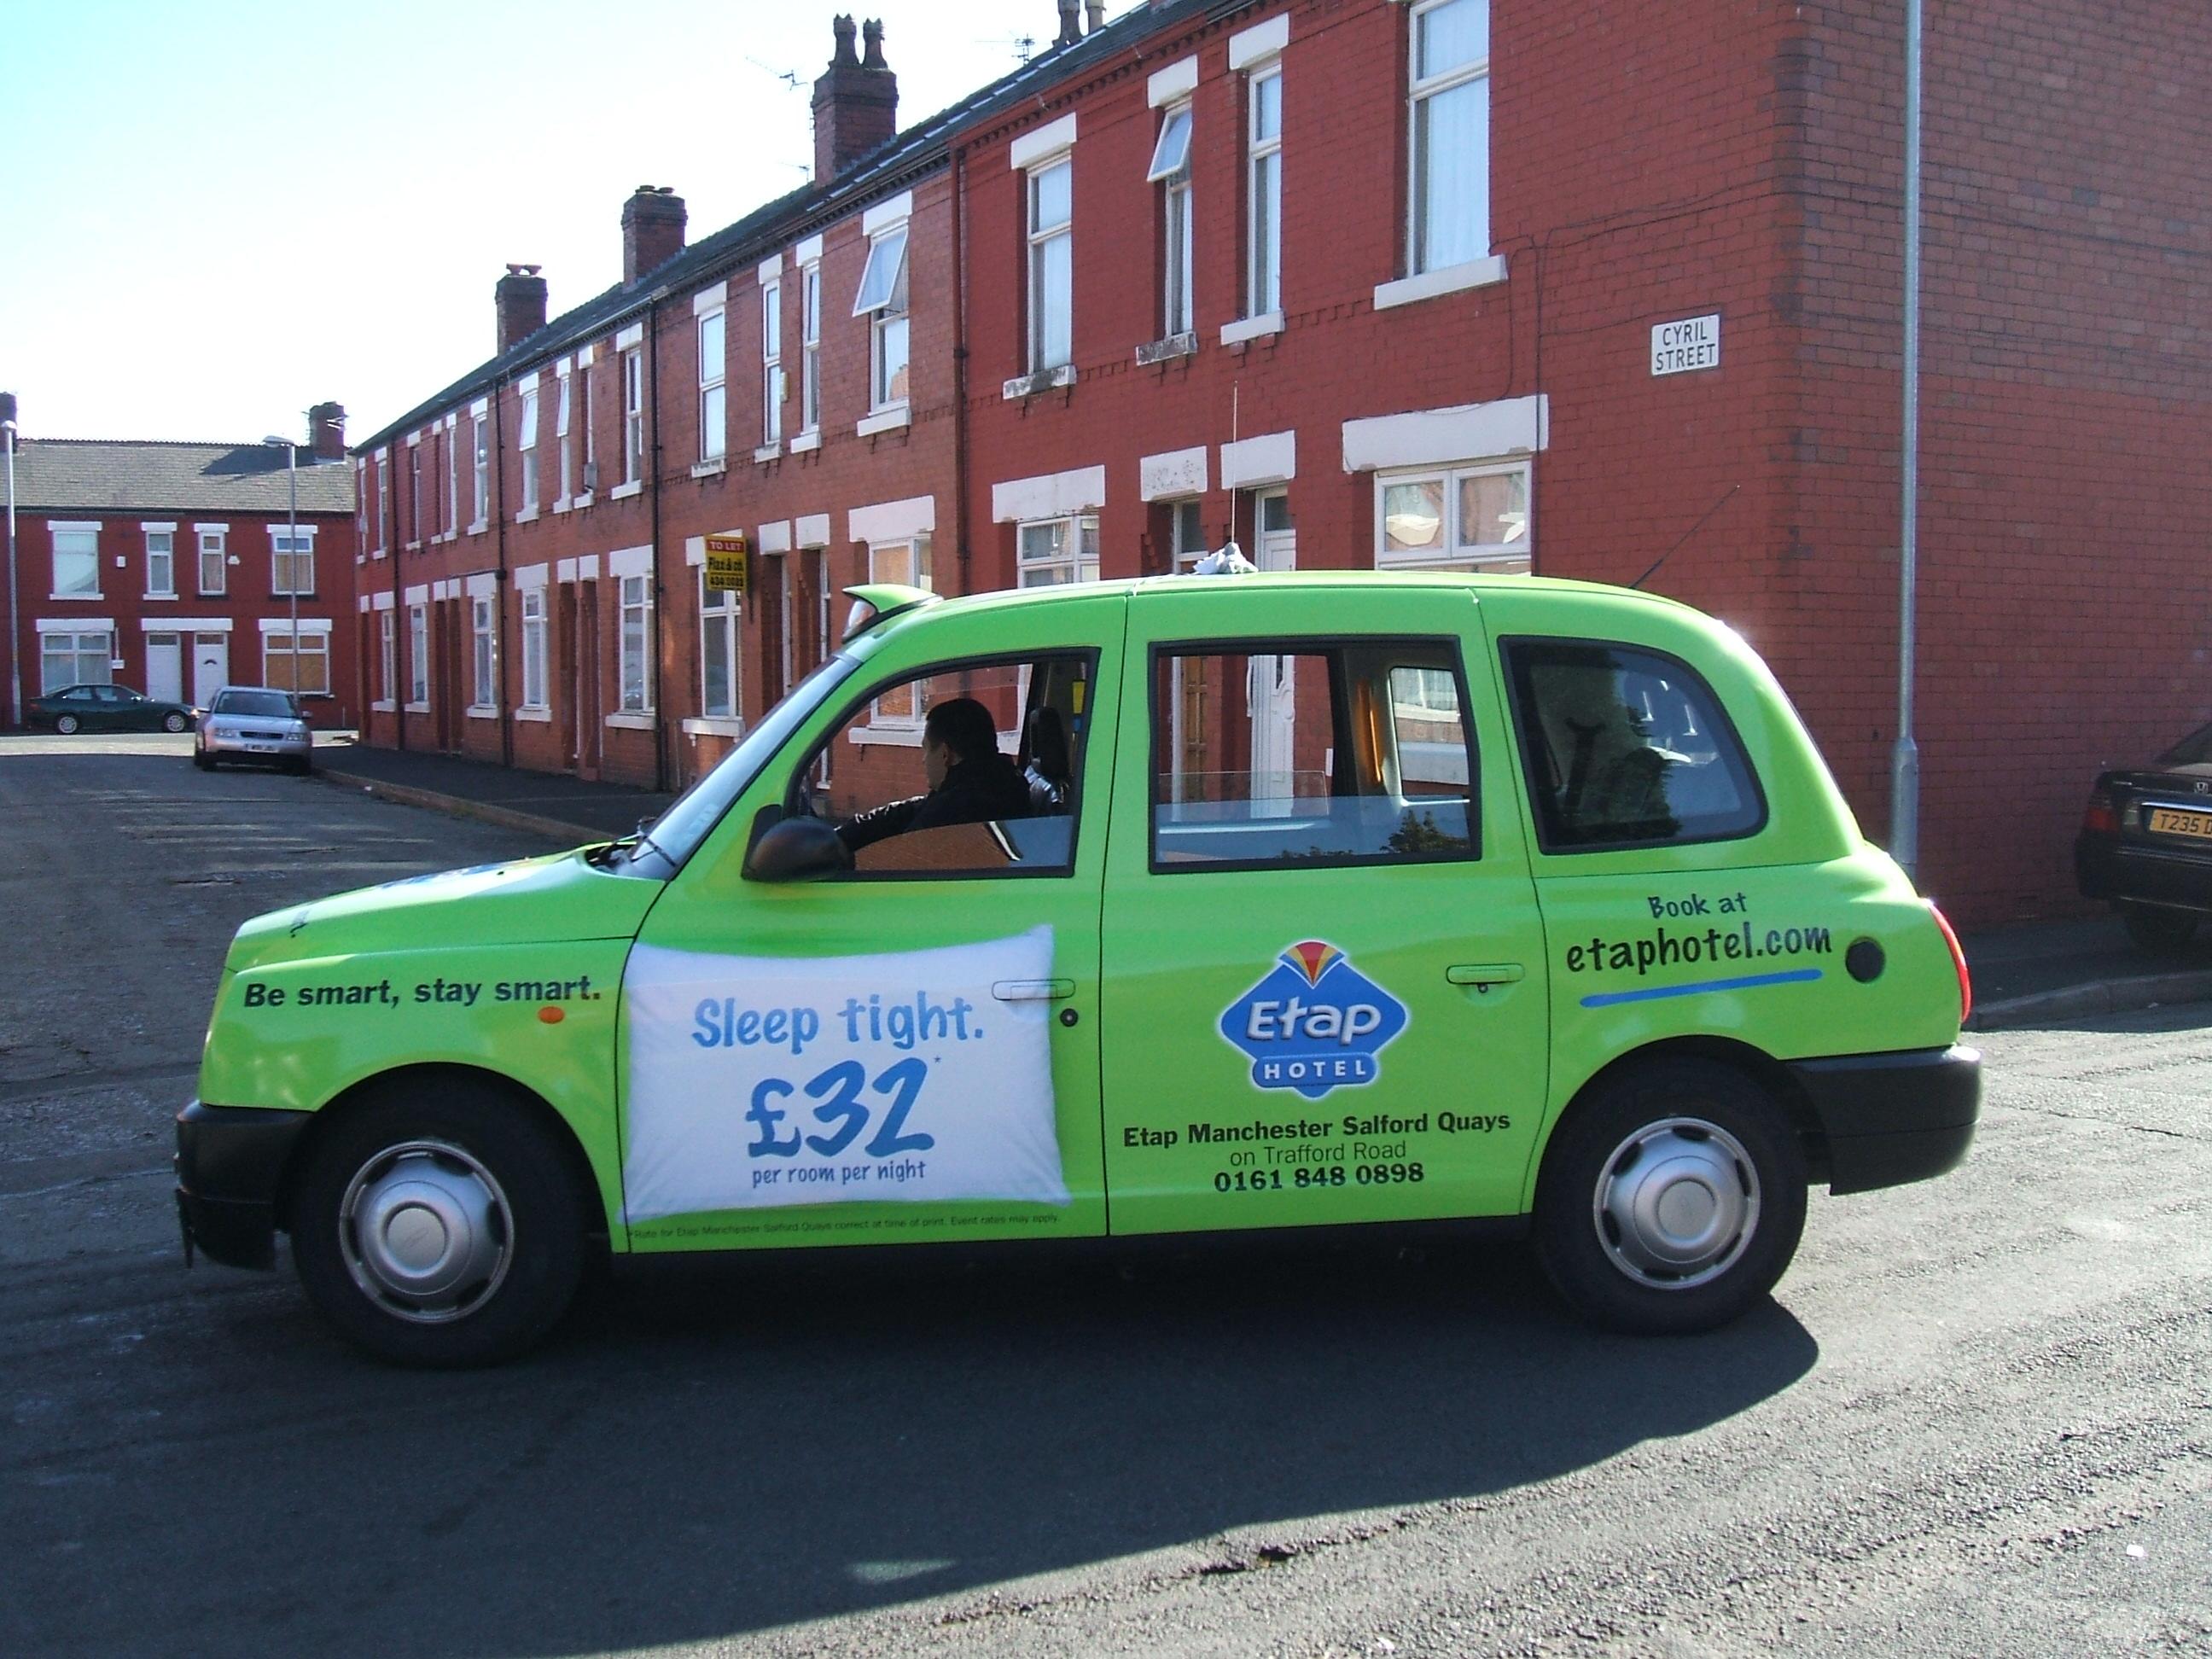 2009 Ubiquitous taxi advertising campaign for Etap - Various